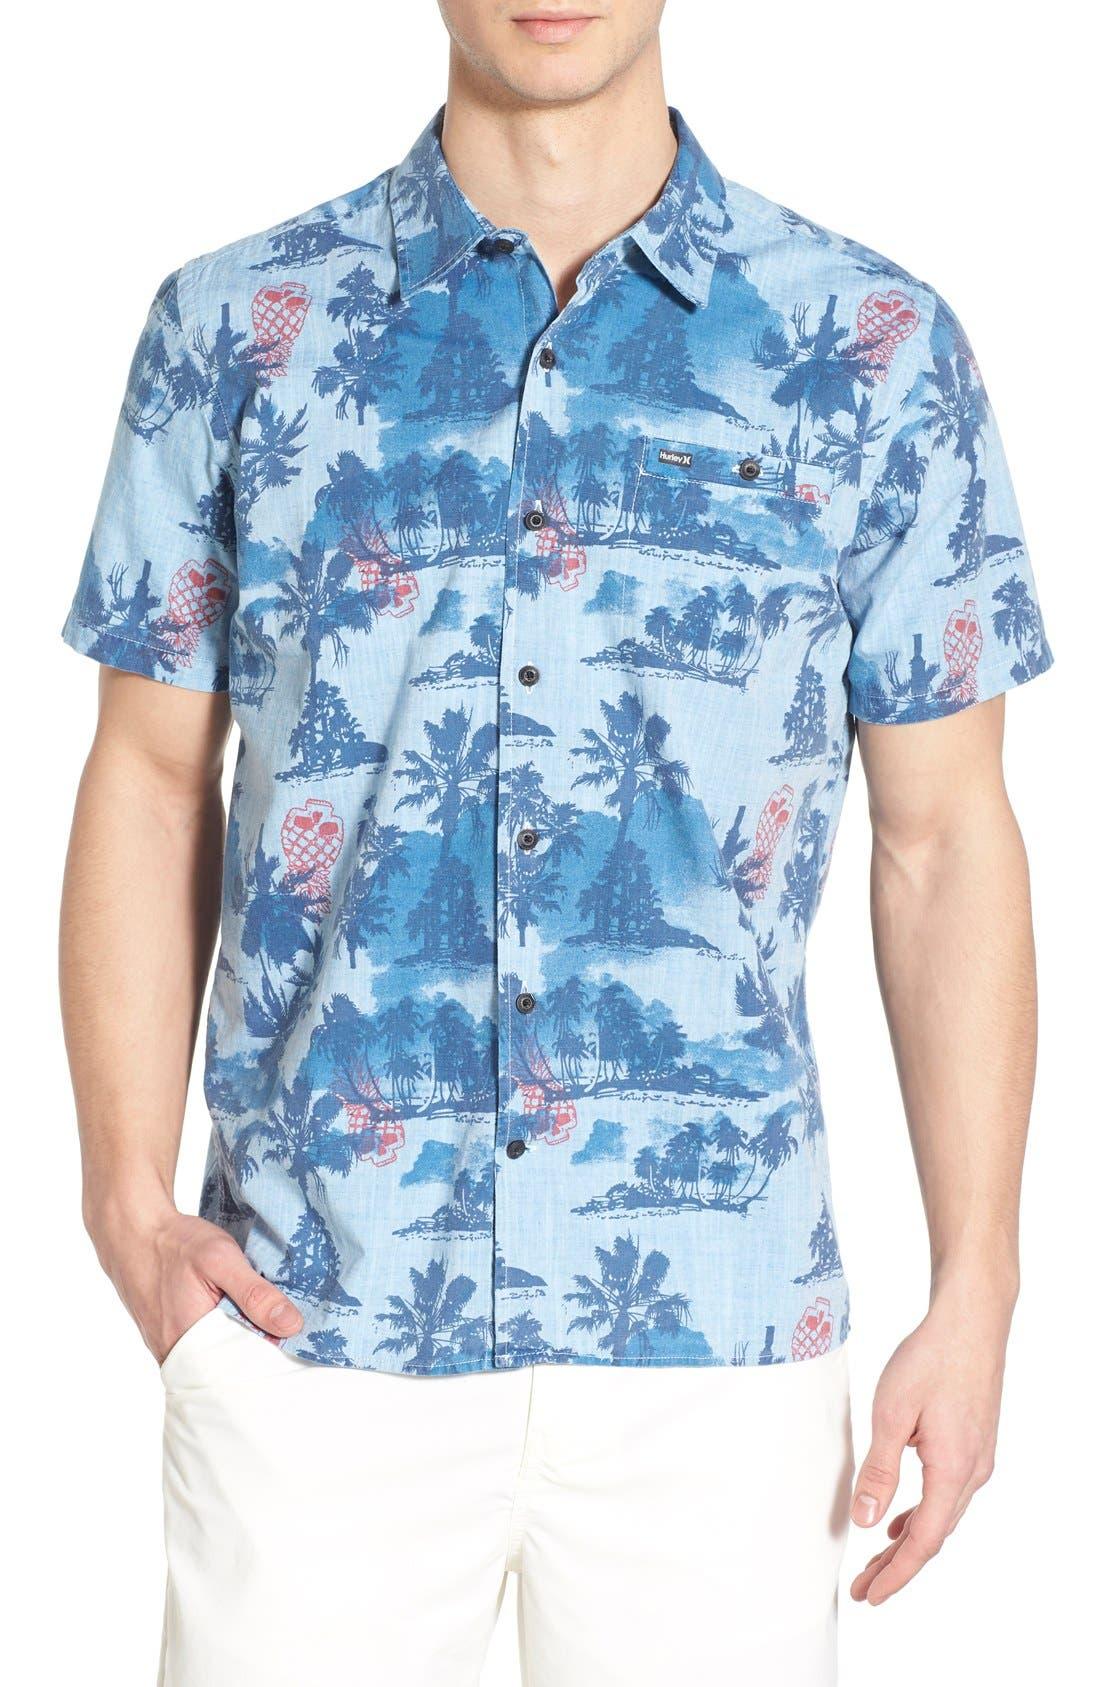 'Capitola' Dri-FIT Print Woven Shirt, Main, color, 411